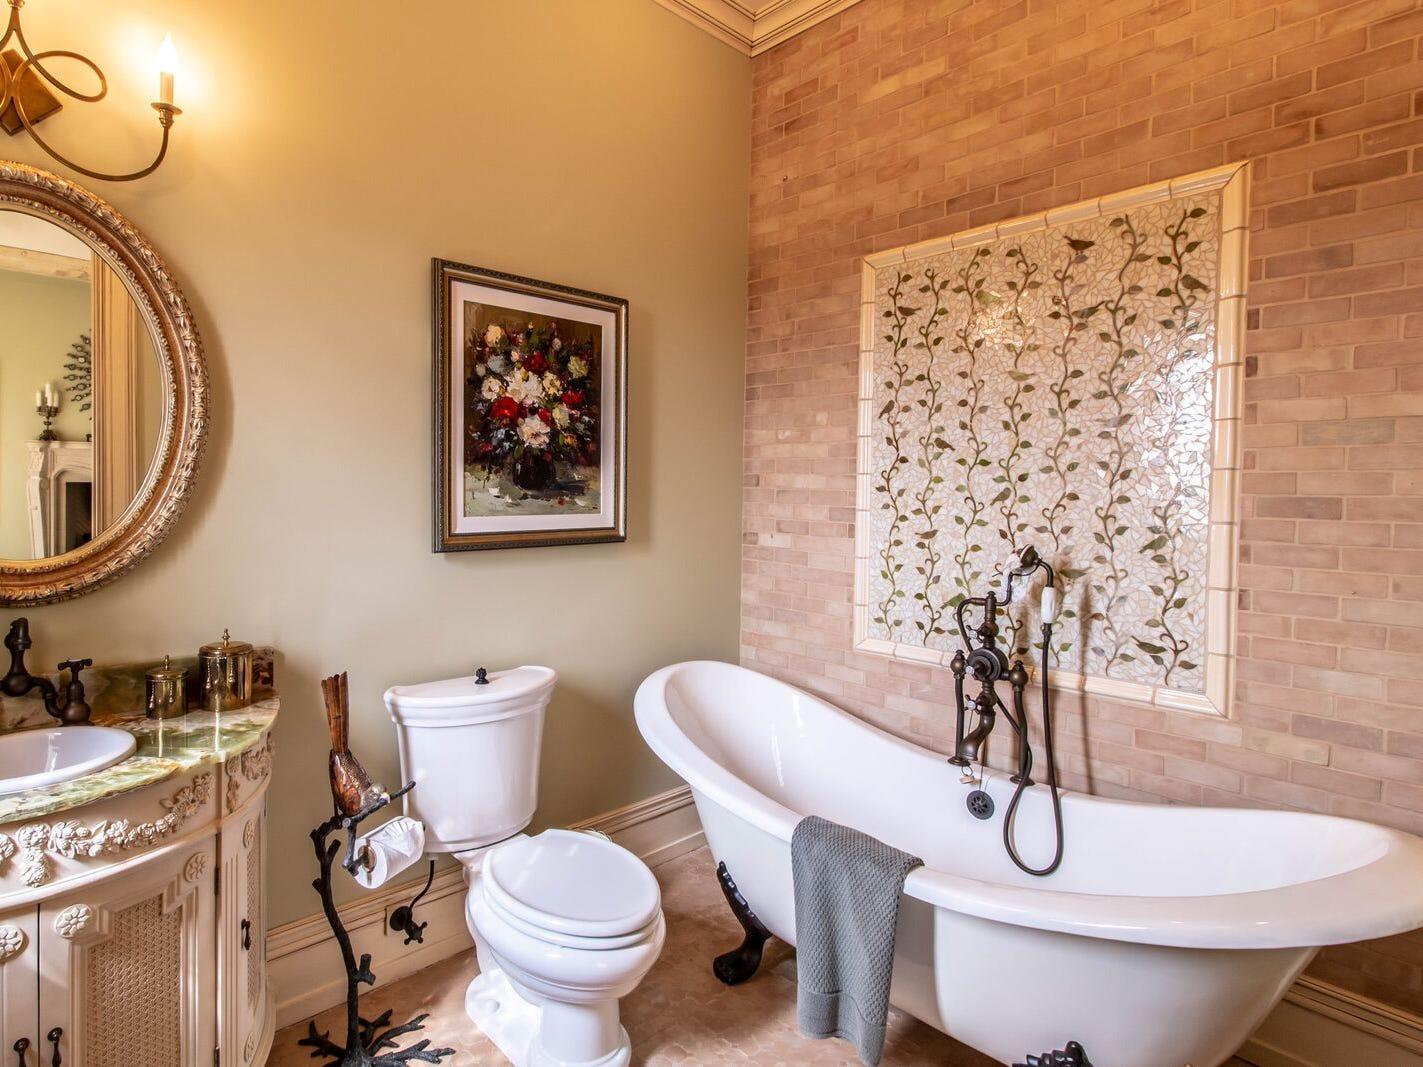 A stately bathroom with clawfoot tub.